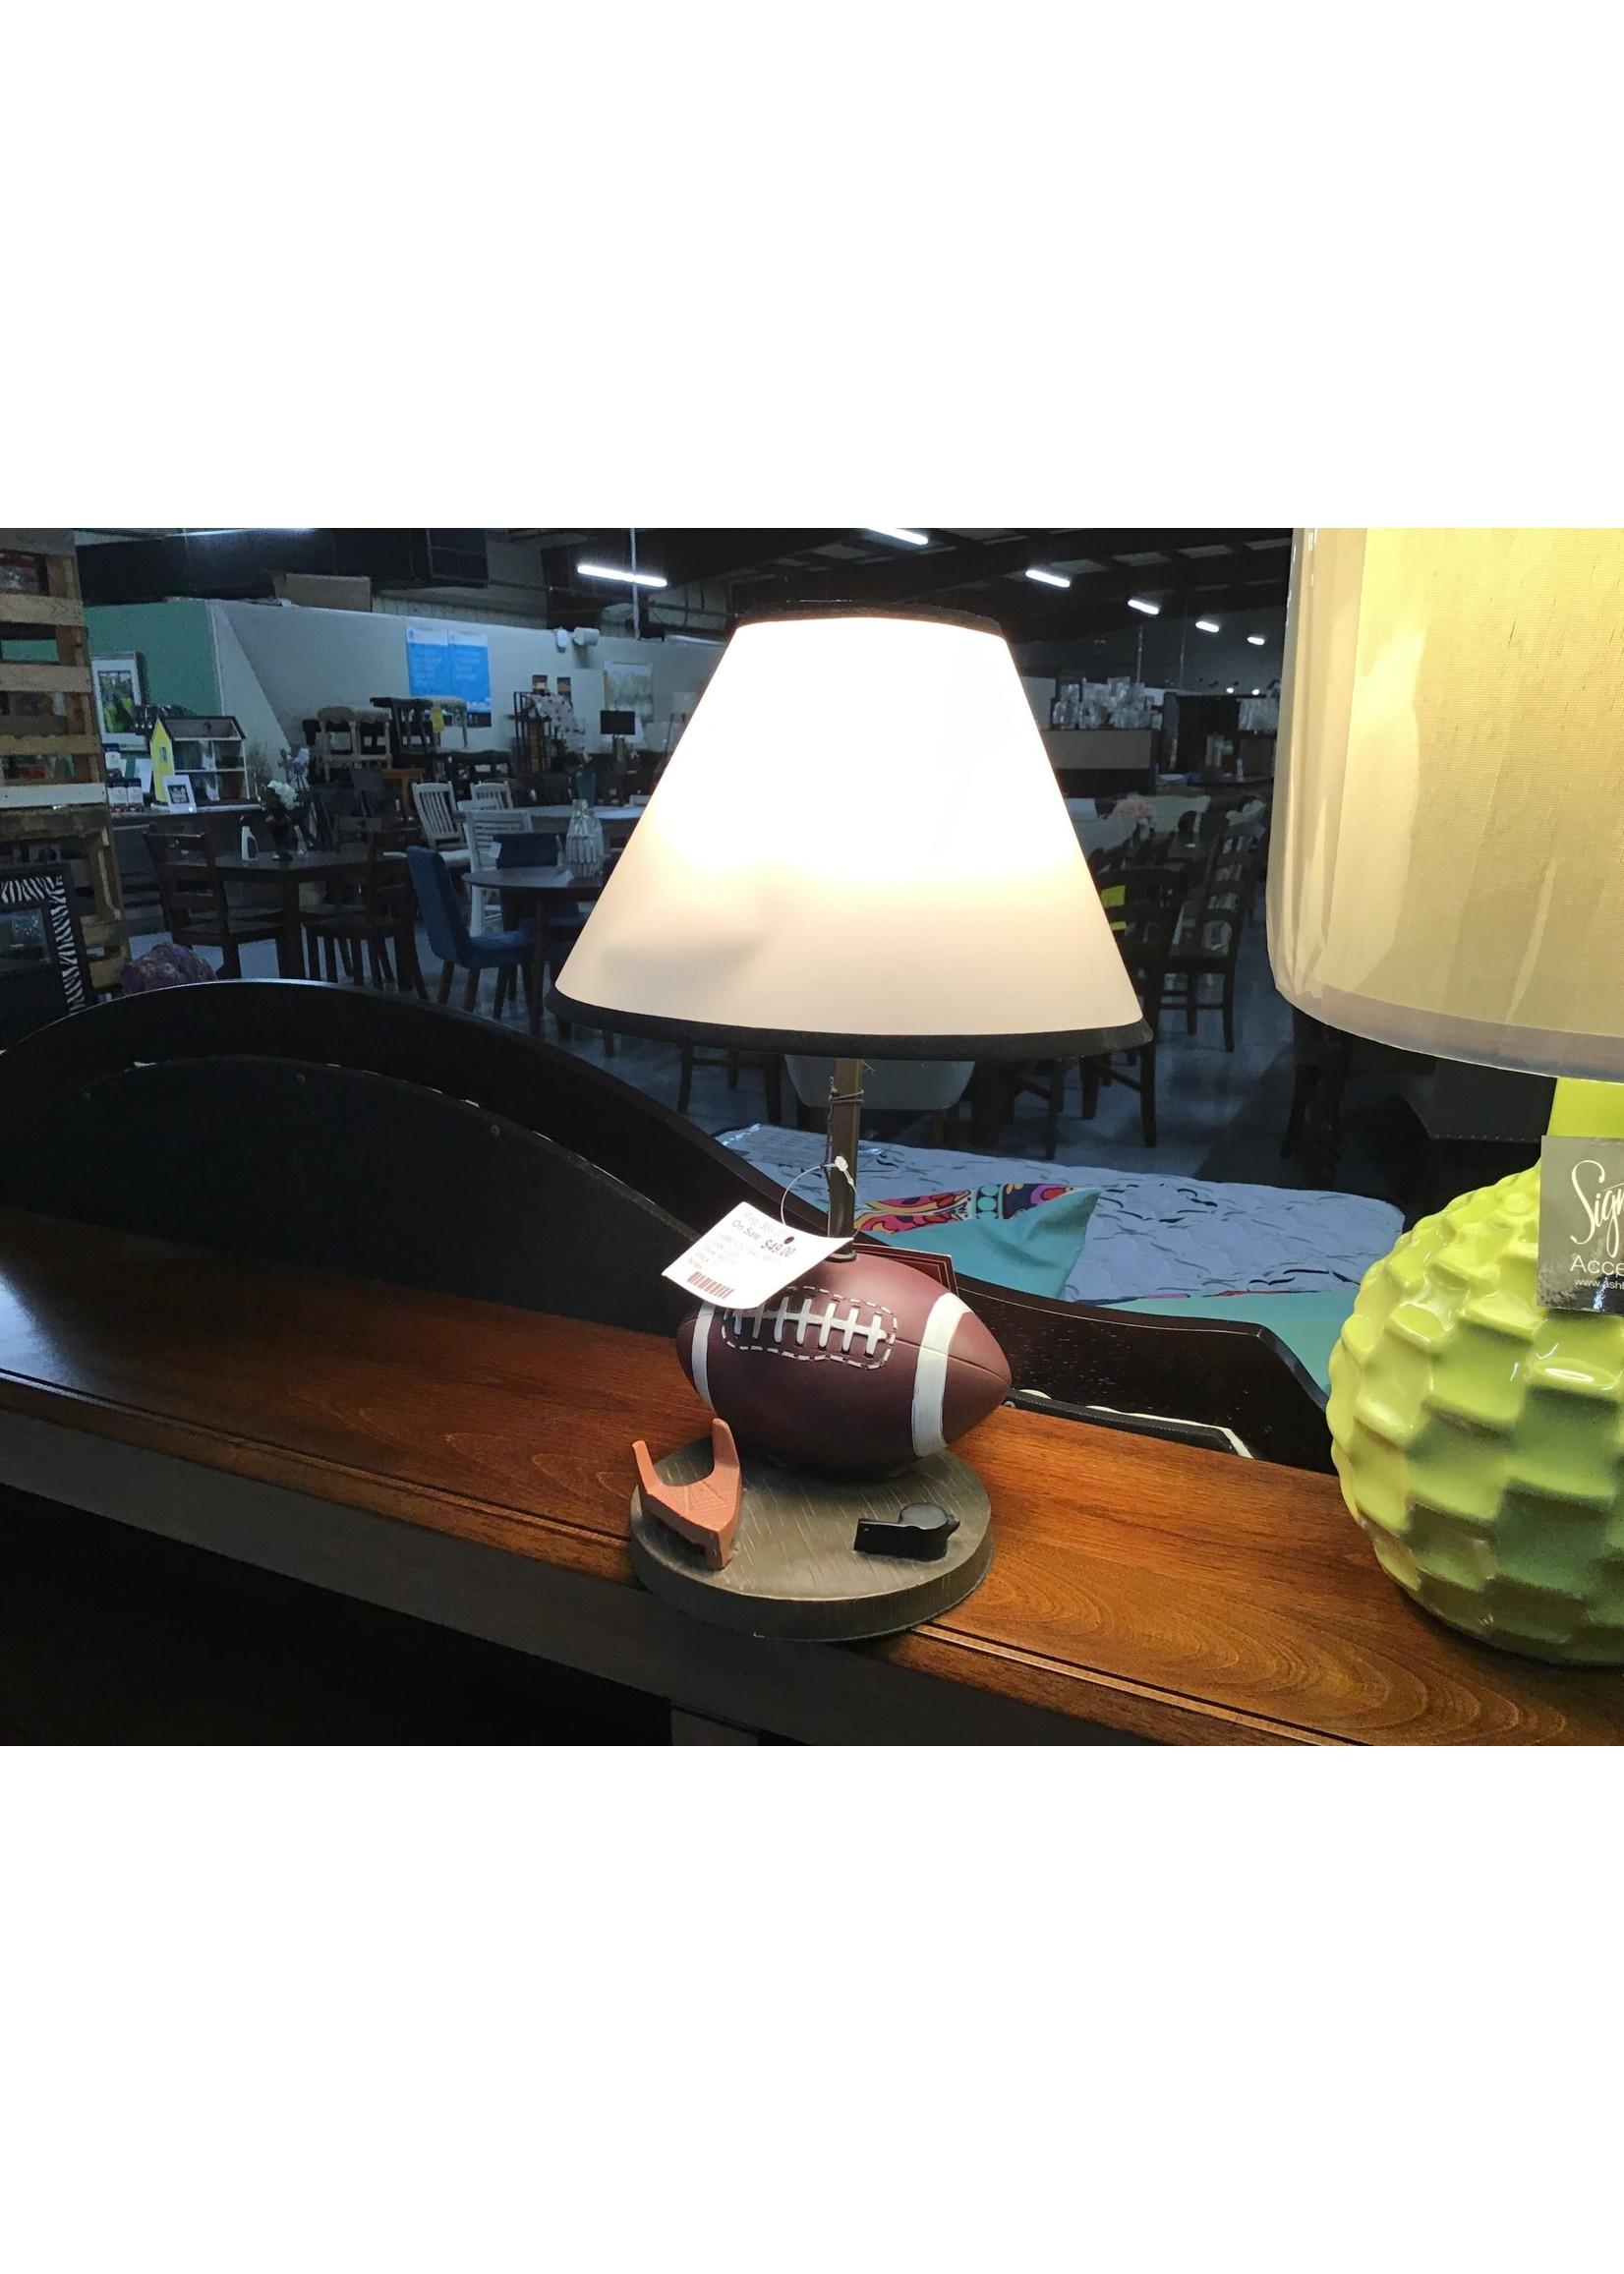 COASTER LAMP FOOTBALL SPORTS